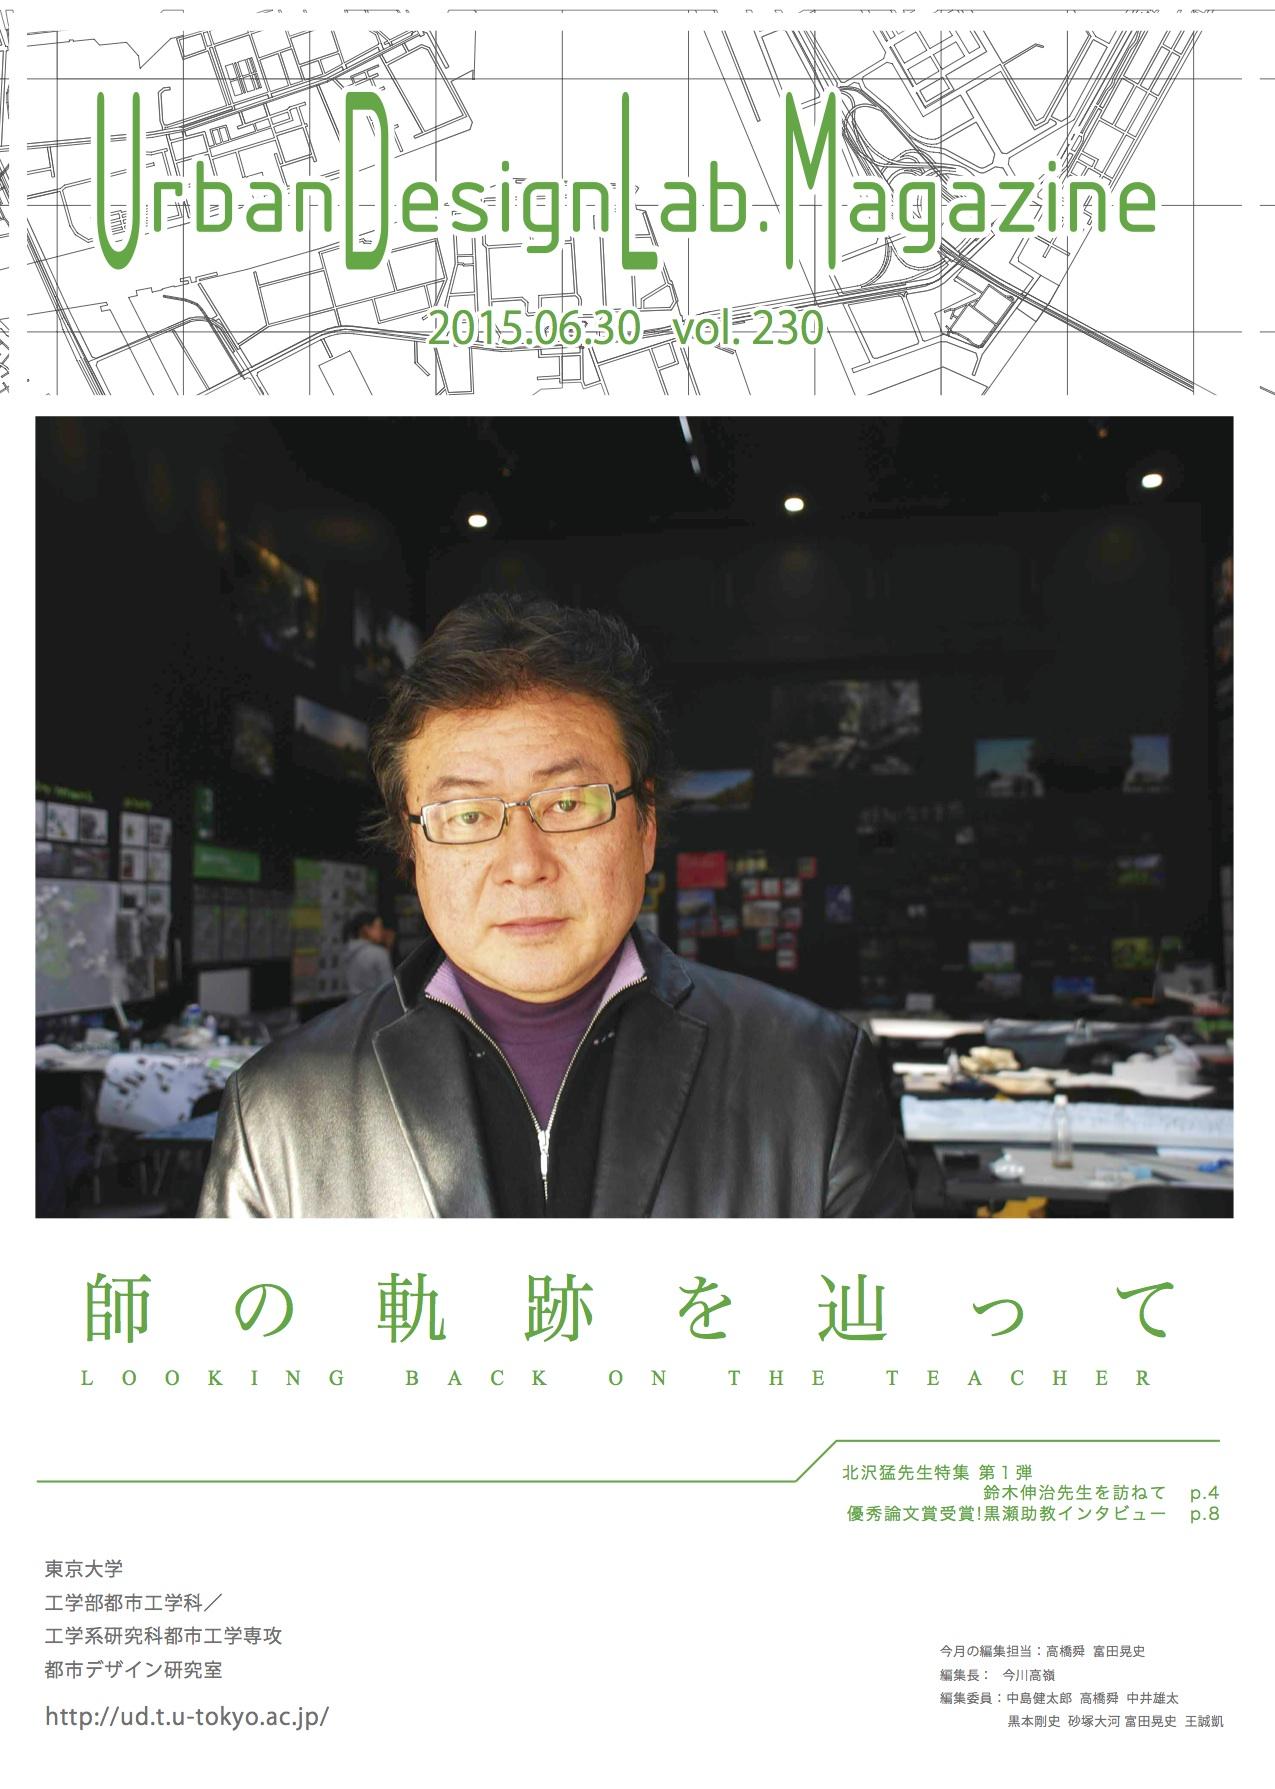 http://ud.t.u-tokyo.ac.jp/blog/_images/magazine230hyoshi.jpg